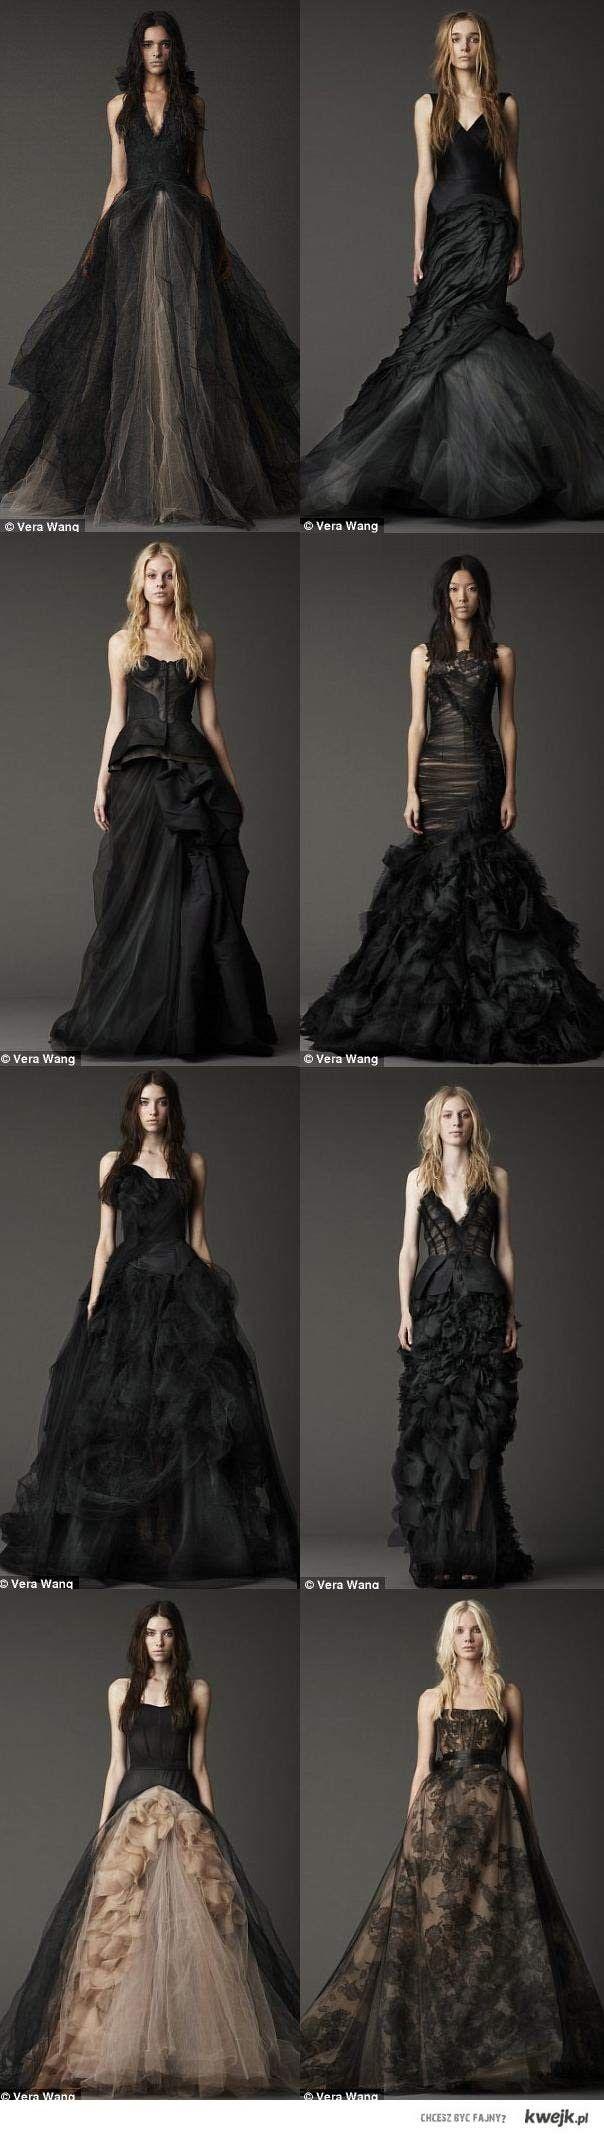 Vera wang prom dresses black